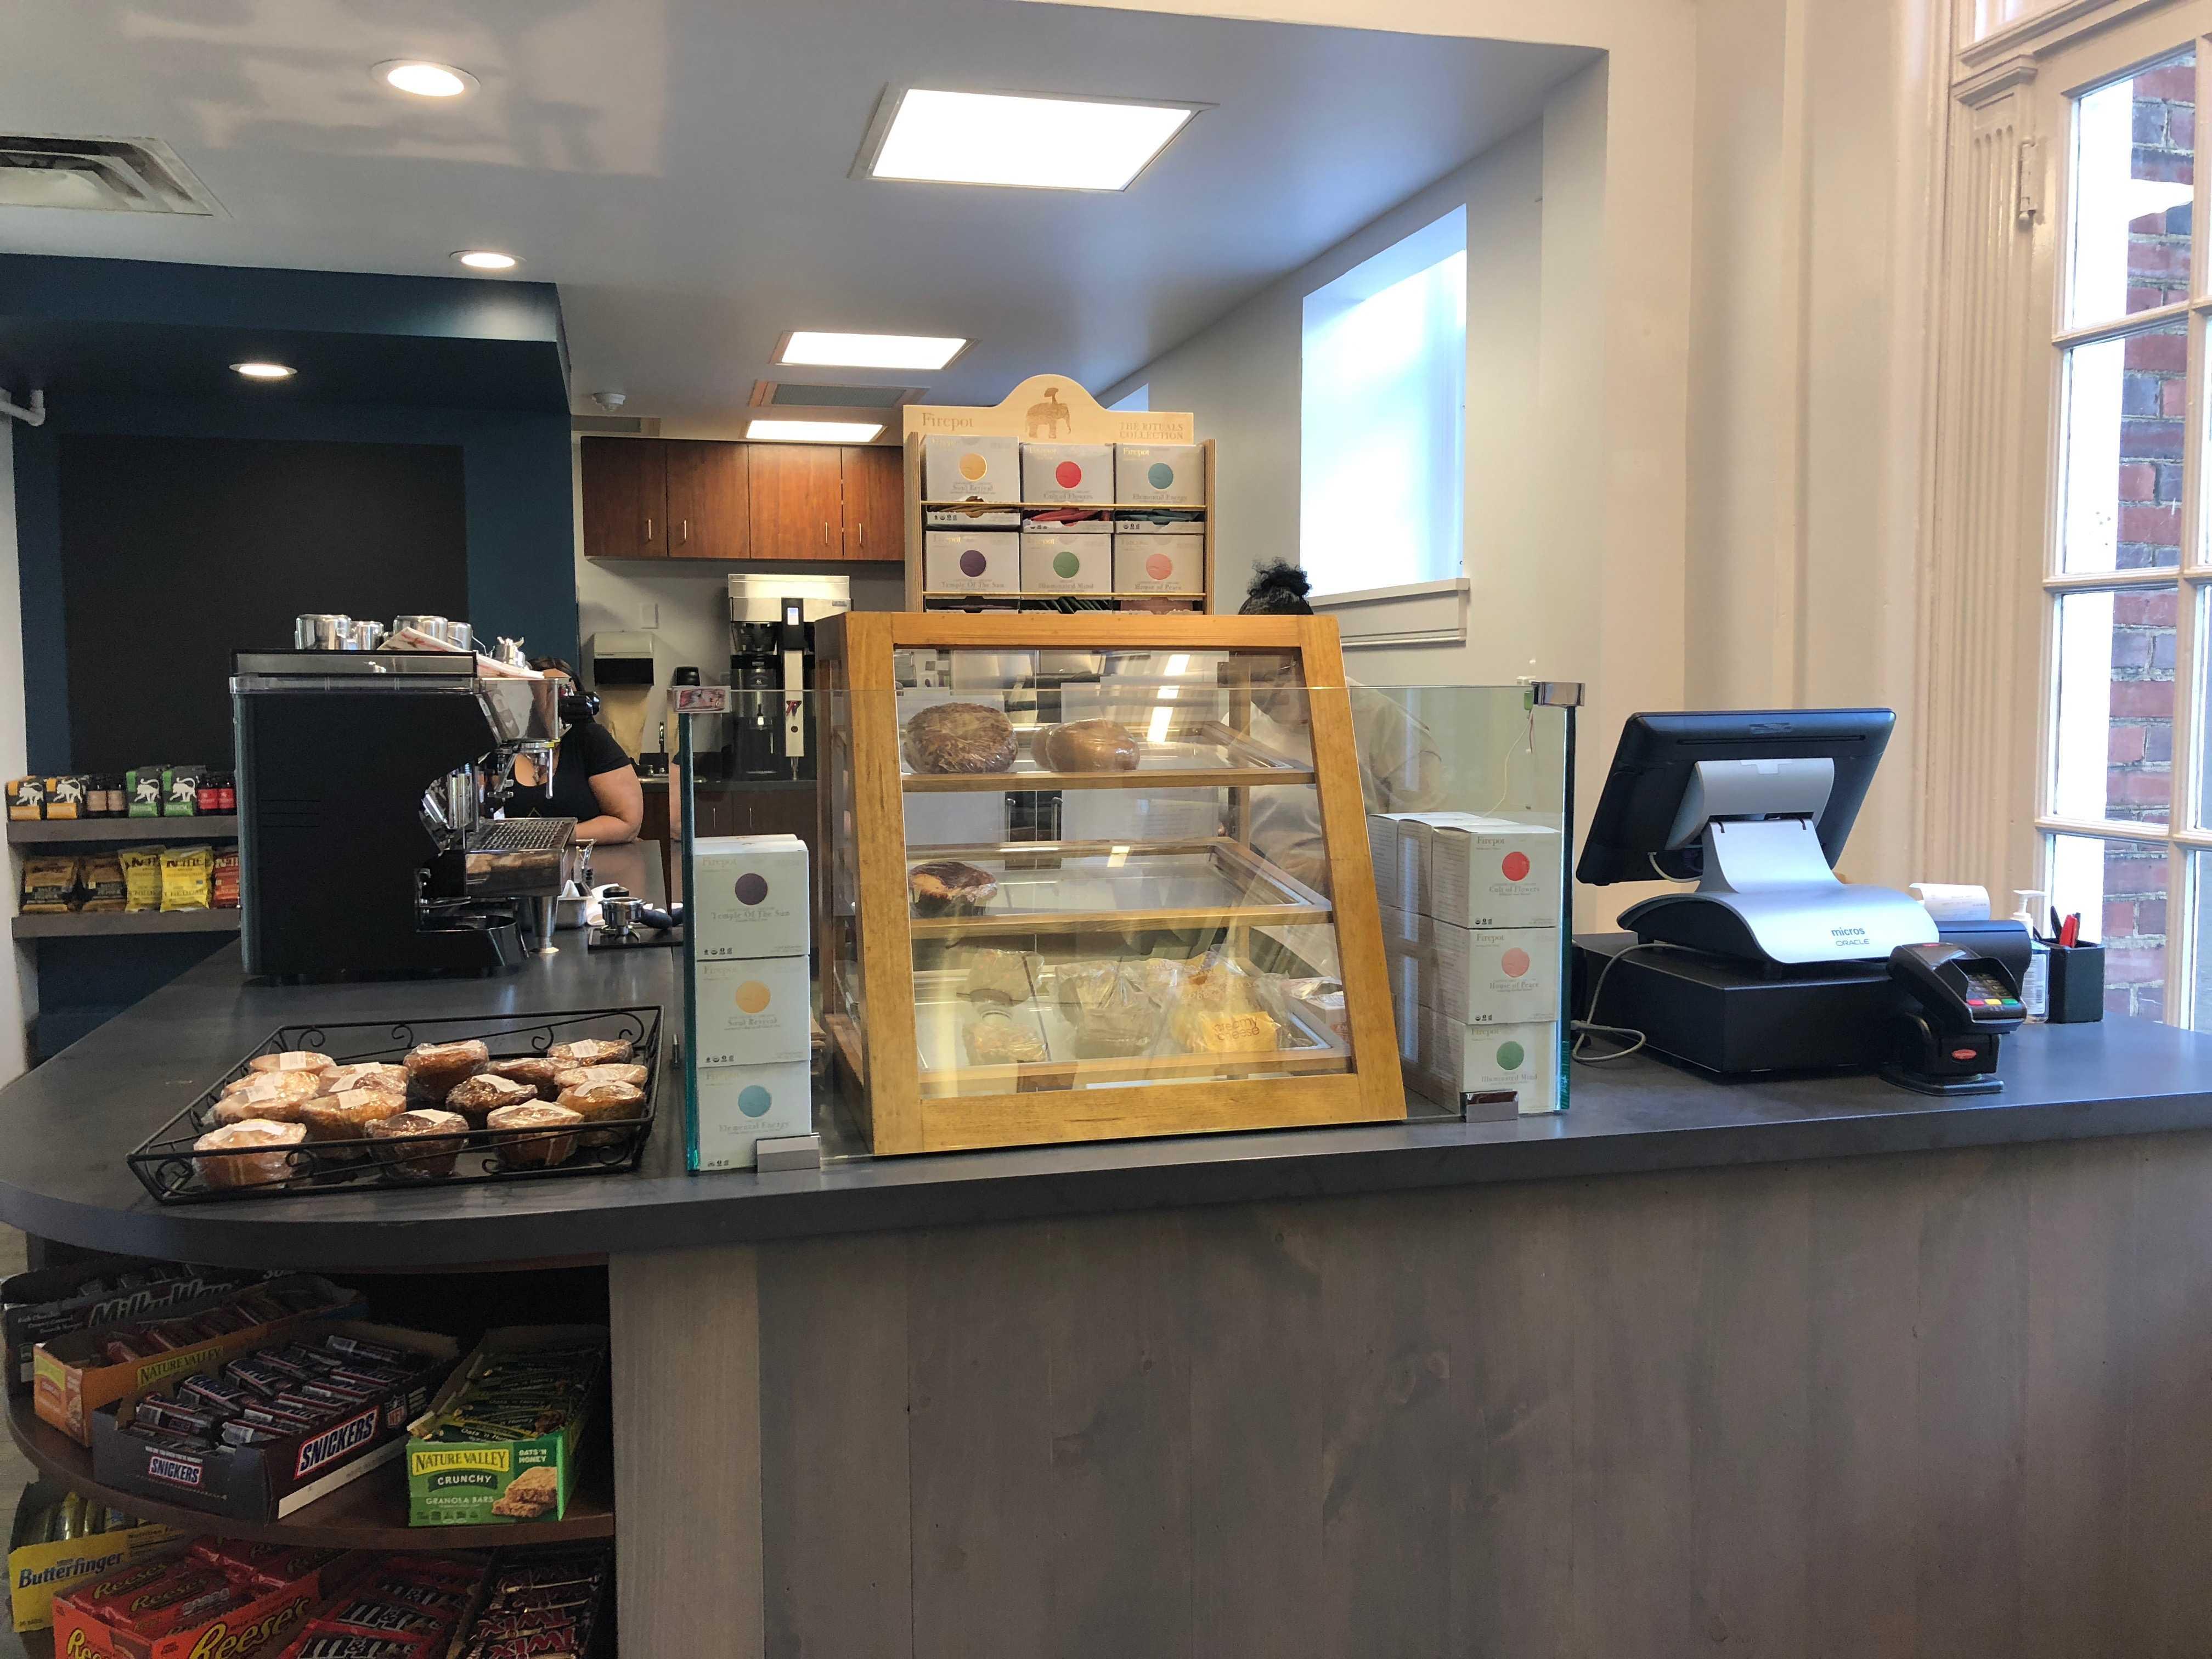 Peabody's Iris Café returns